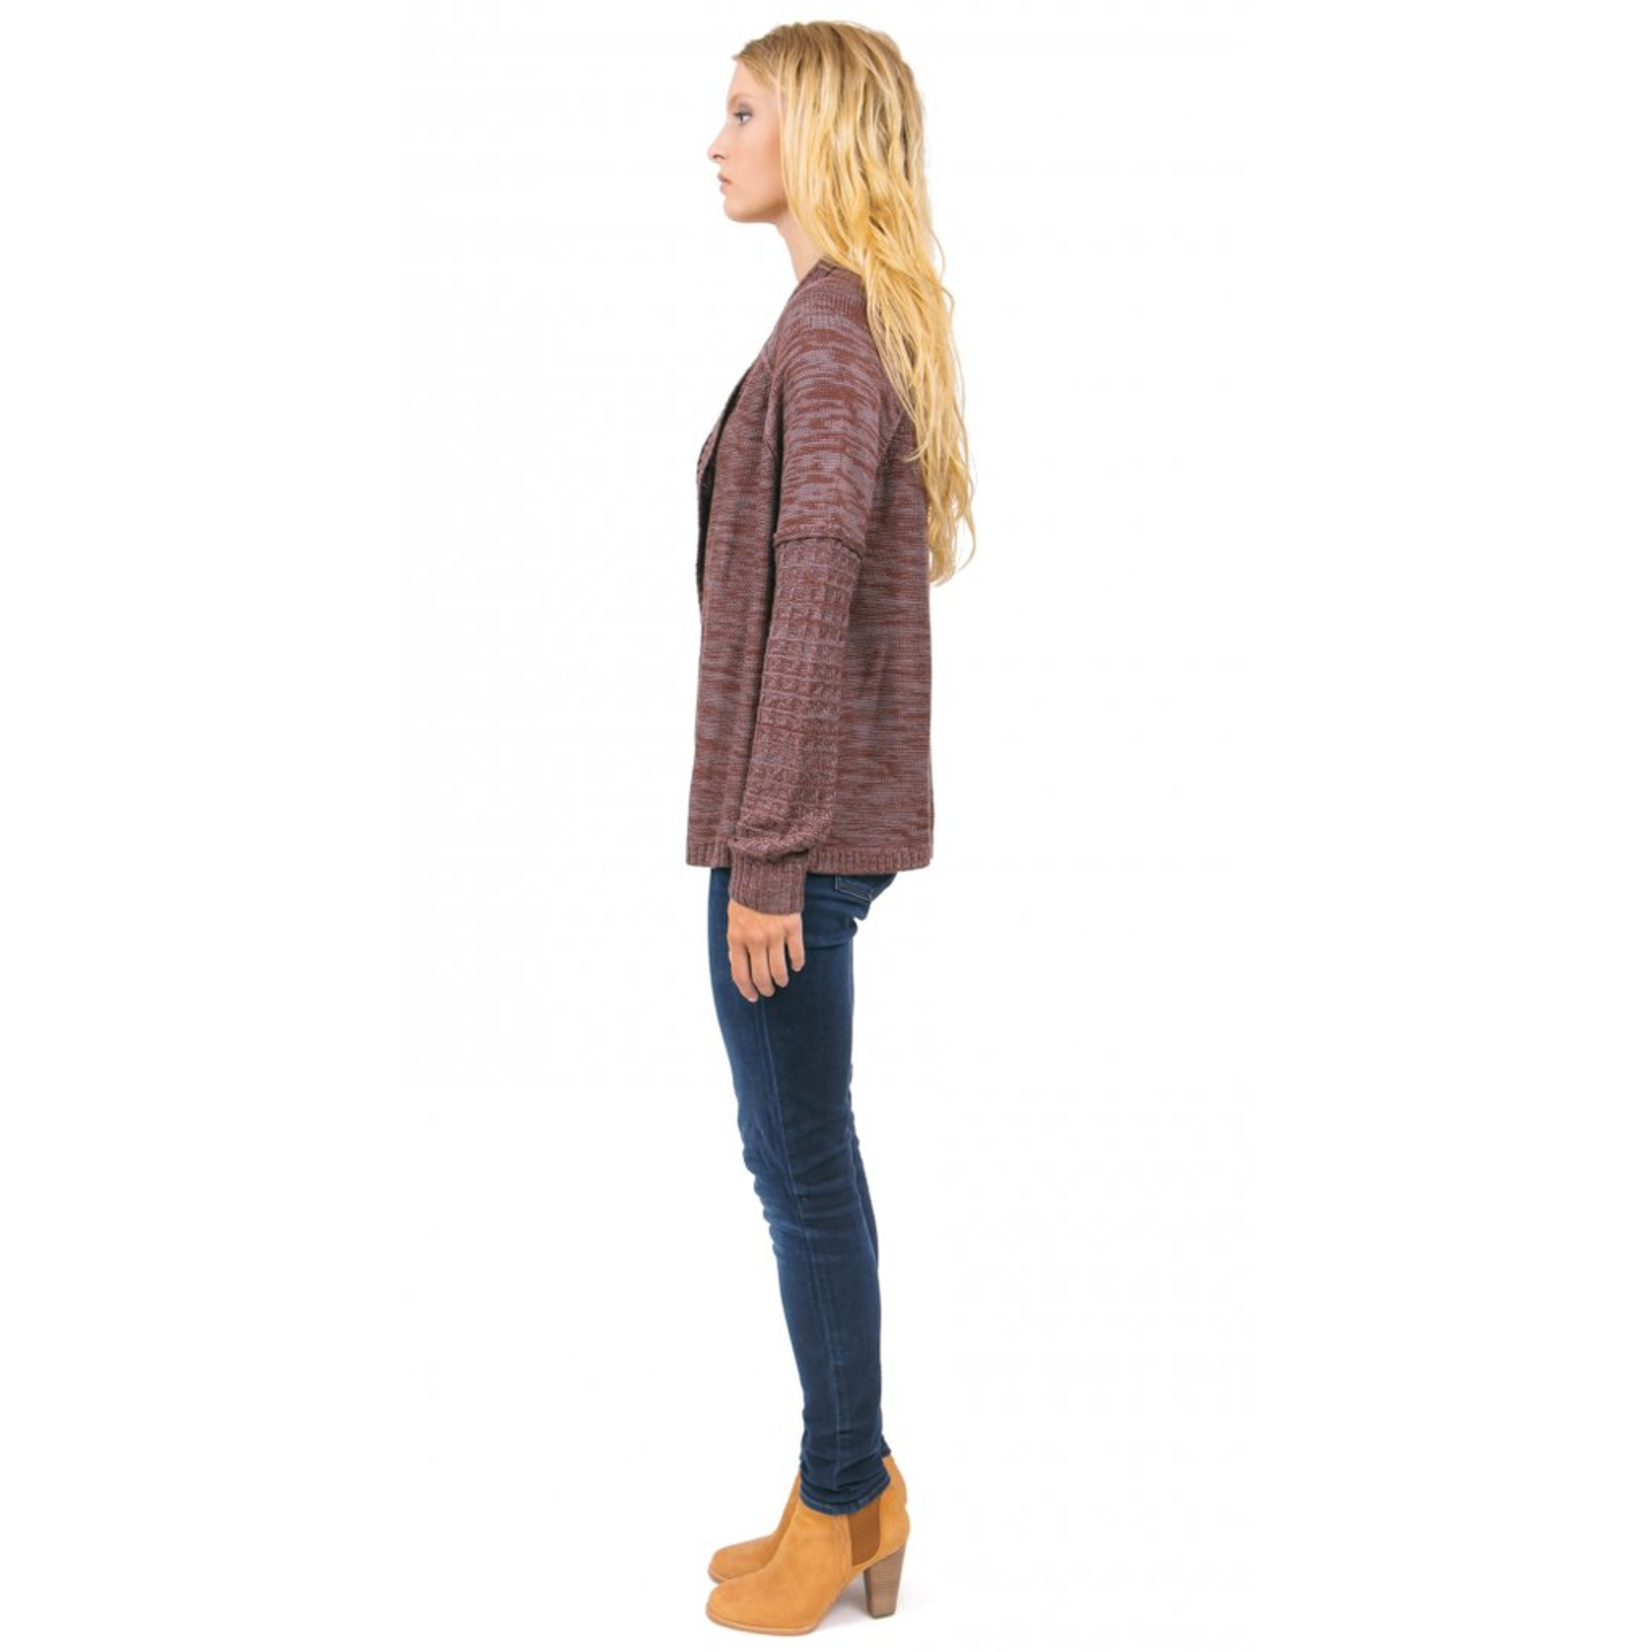 Gentle Fawn Gentle Fawn Sequoia Sweater